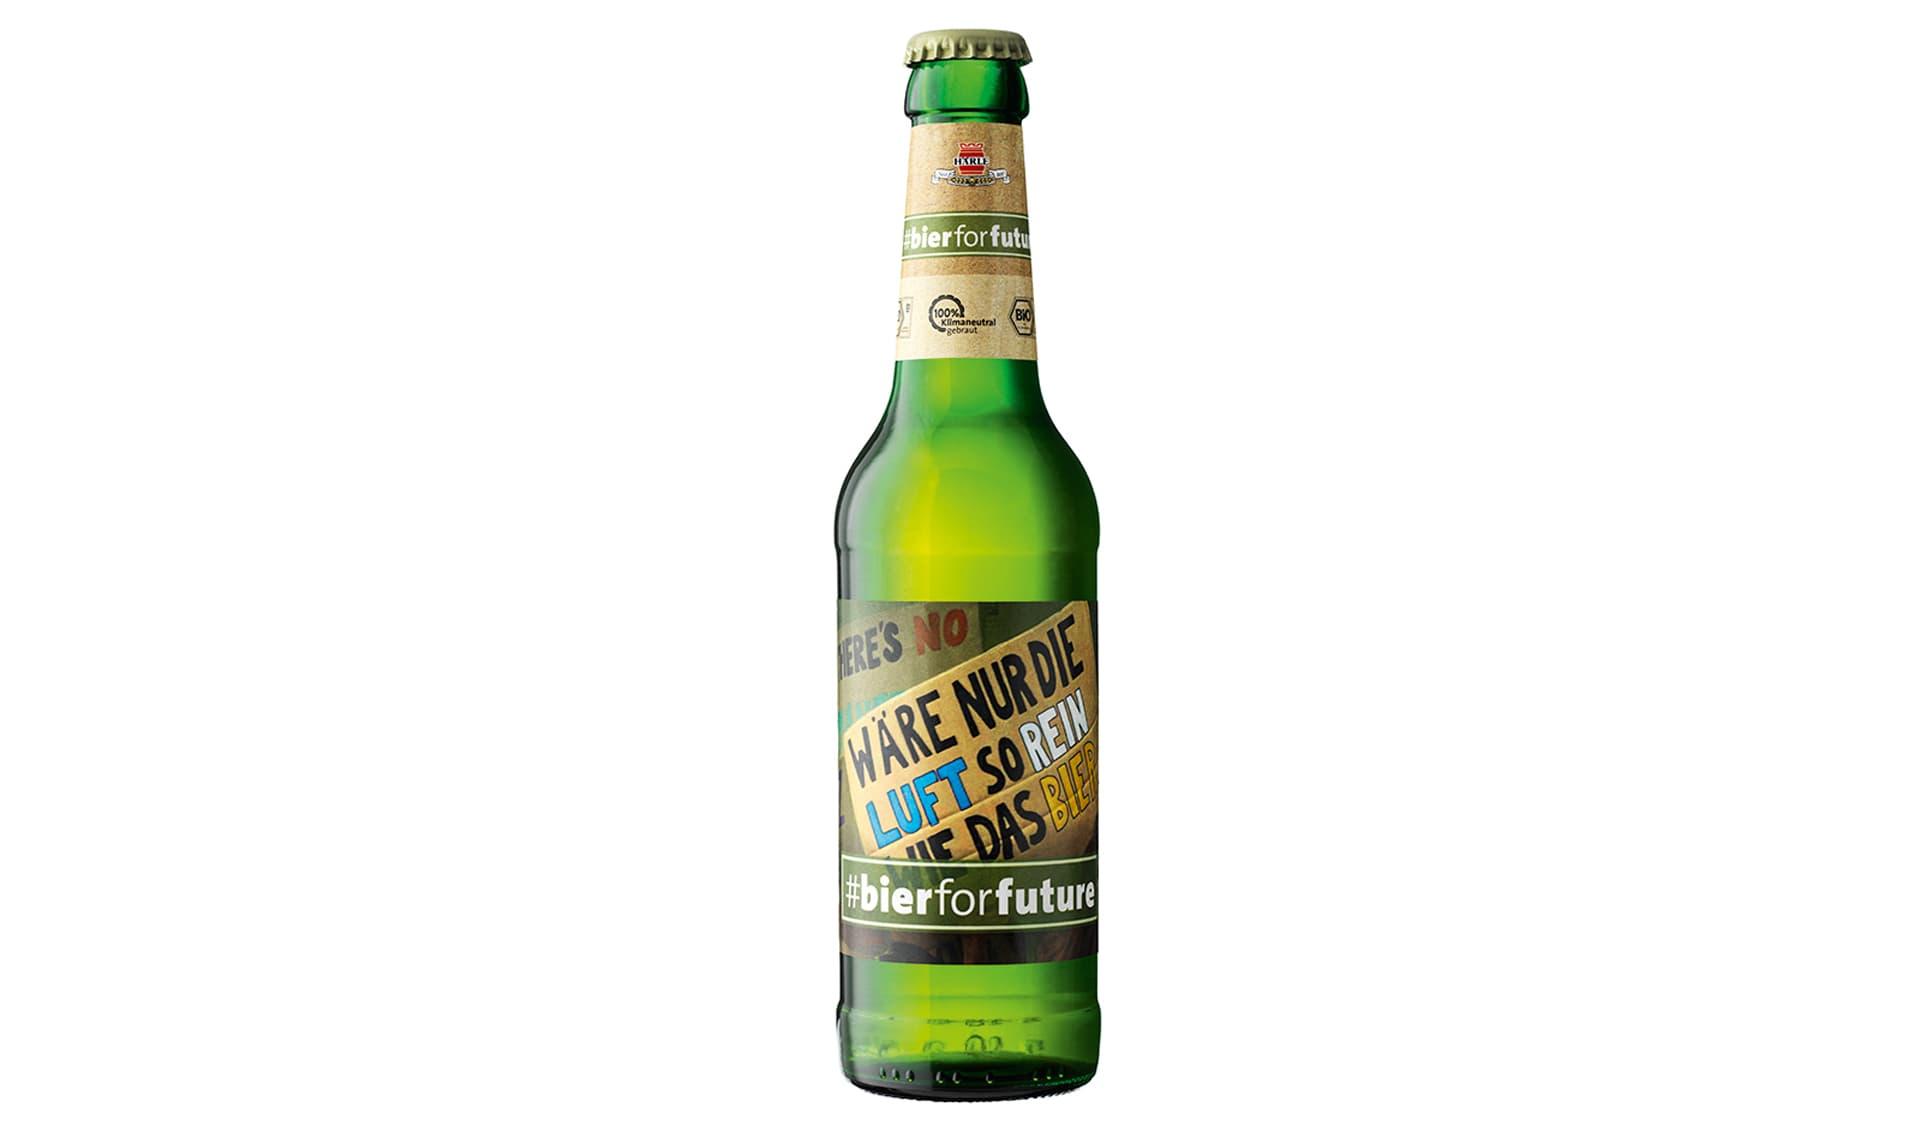 Brauerei Clemens Härle Bierforfuture (www.haerle.de)